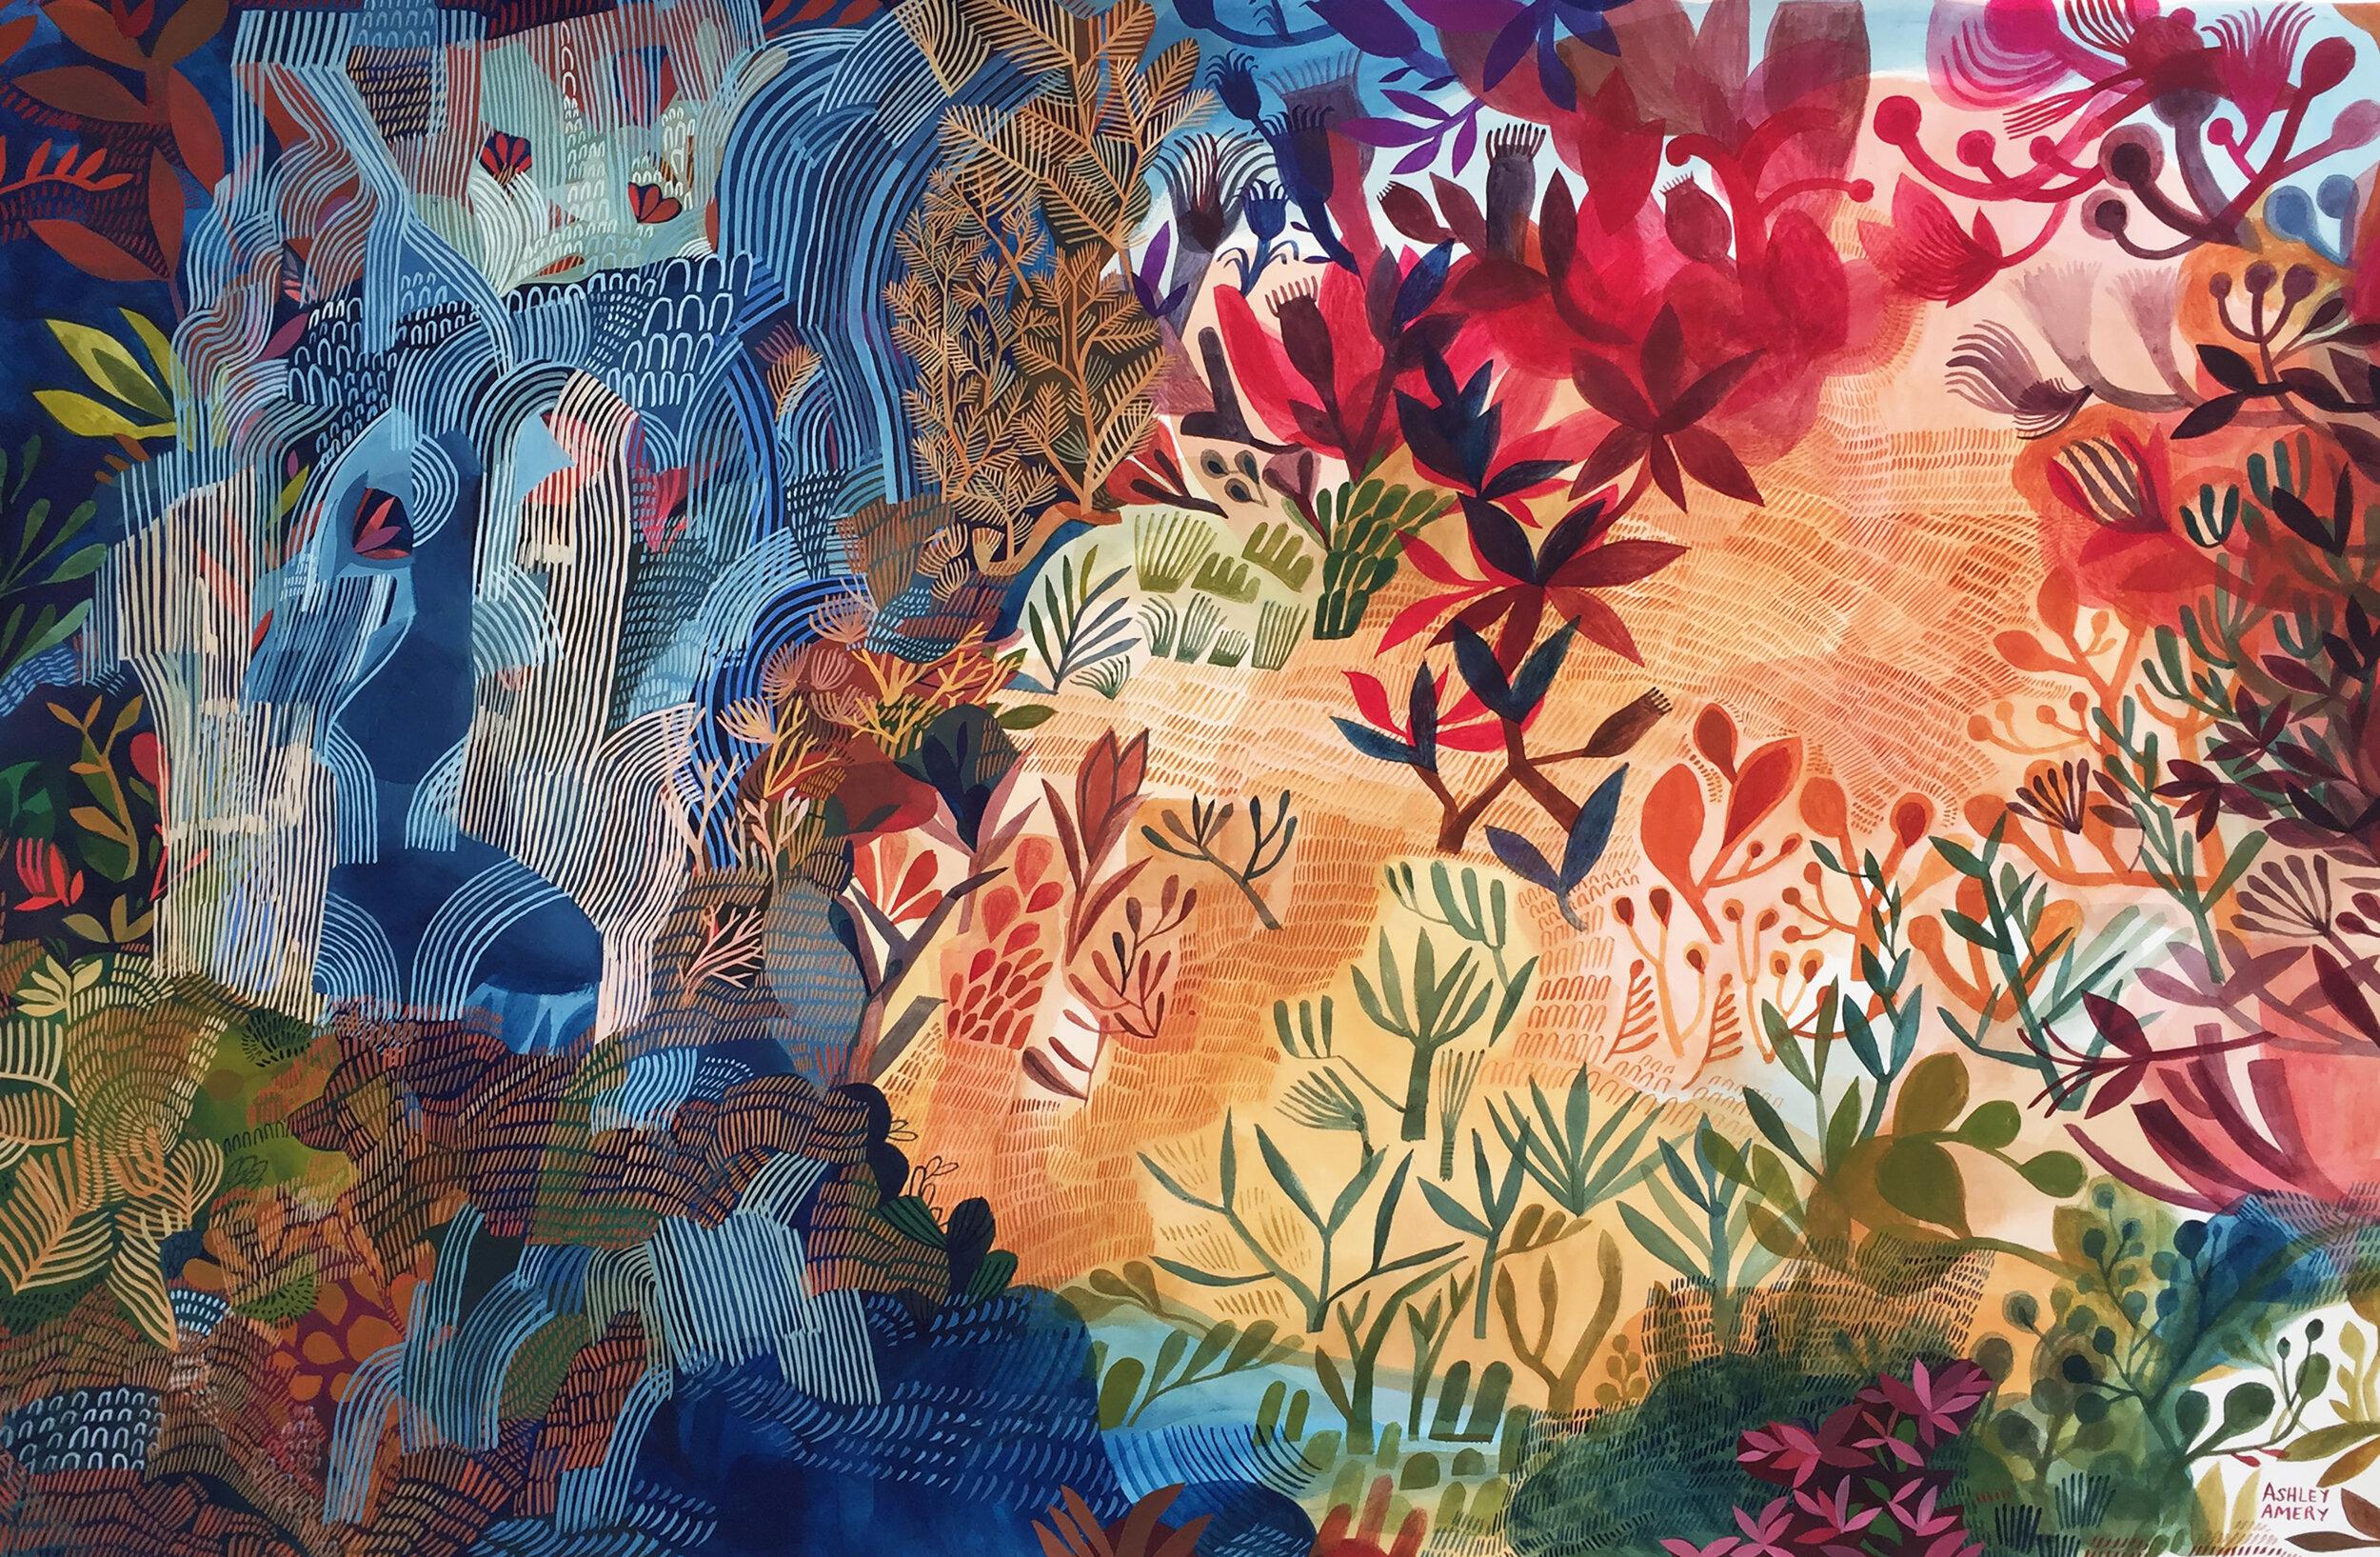 ''Desert Shore' / Ashley Amery / 2019 / 102 x 67 cm / Gouche on Paper